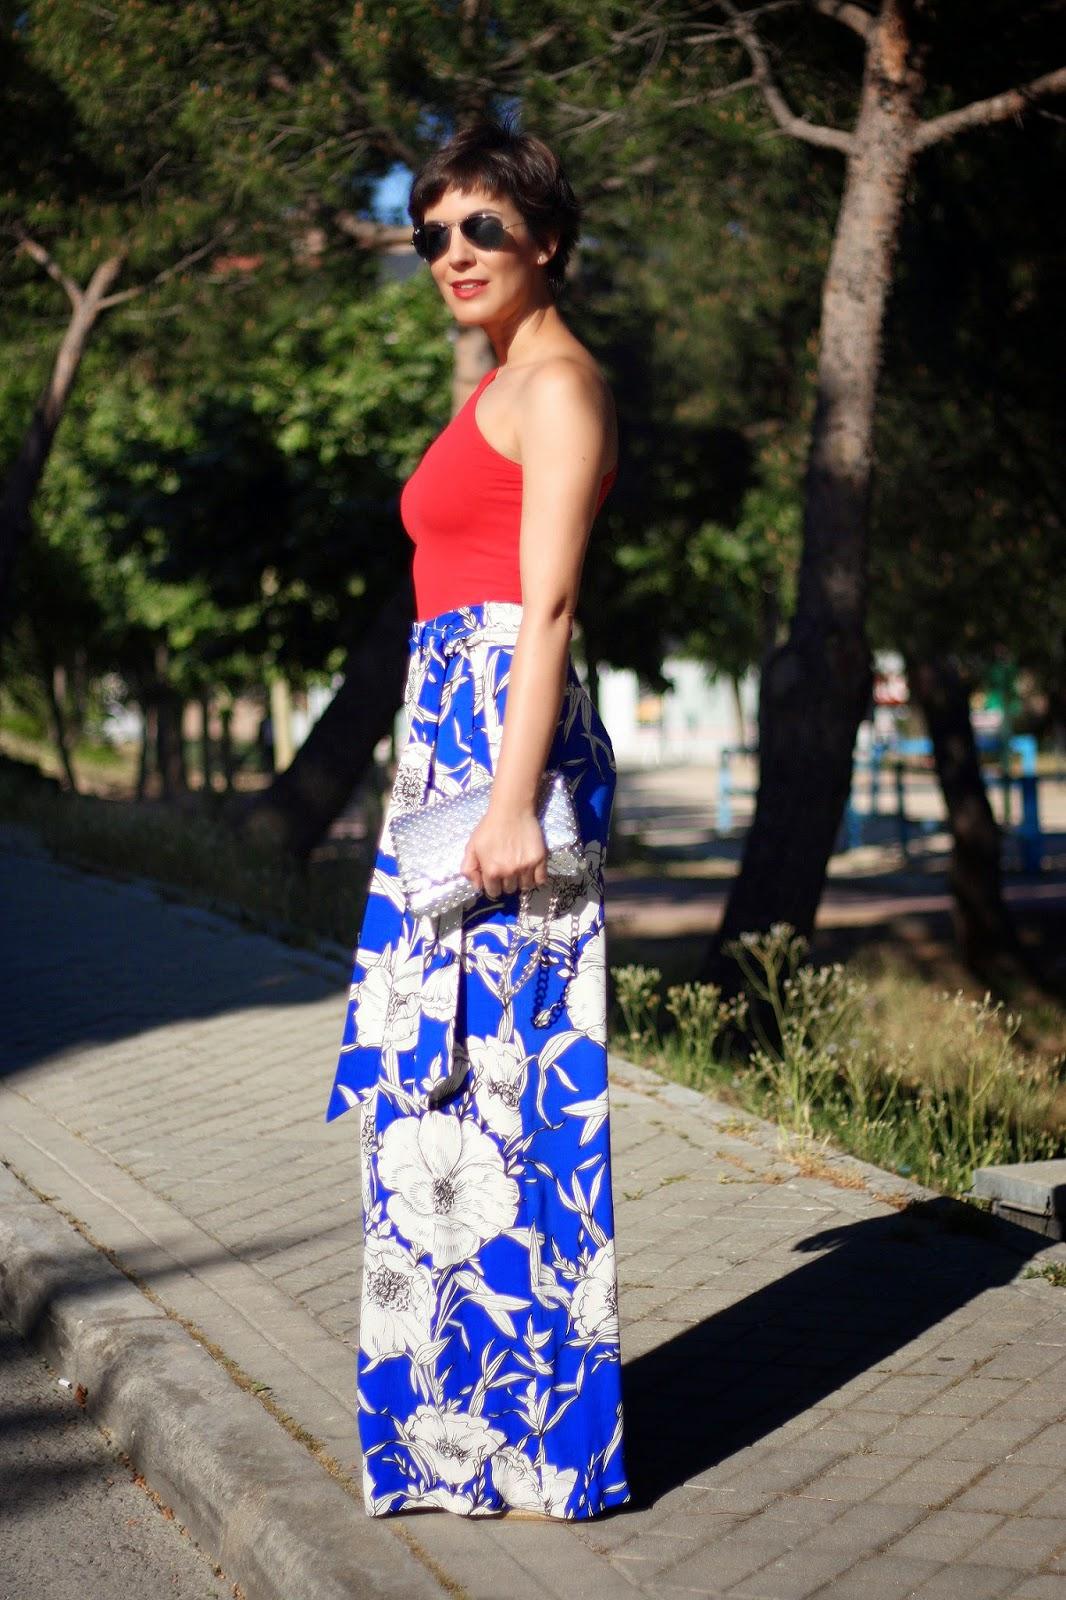 7364eb730df06 Ohmyblog blogger outfit combinar pantalon palazzo top asimetrico  streetstyle pixie cut short hair style jpg 1066x1600